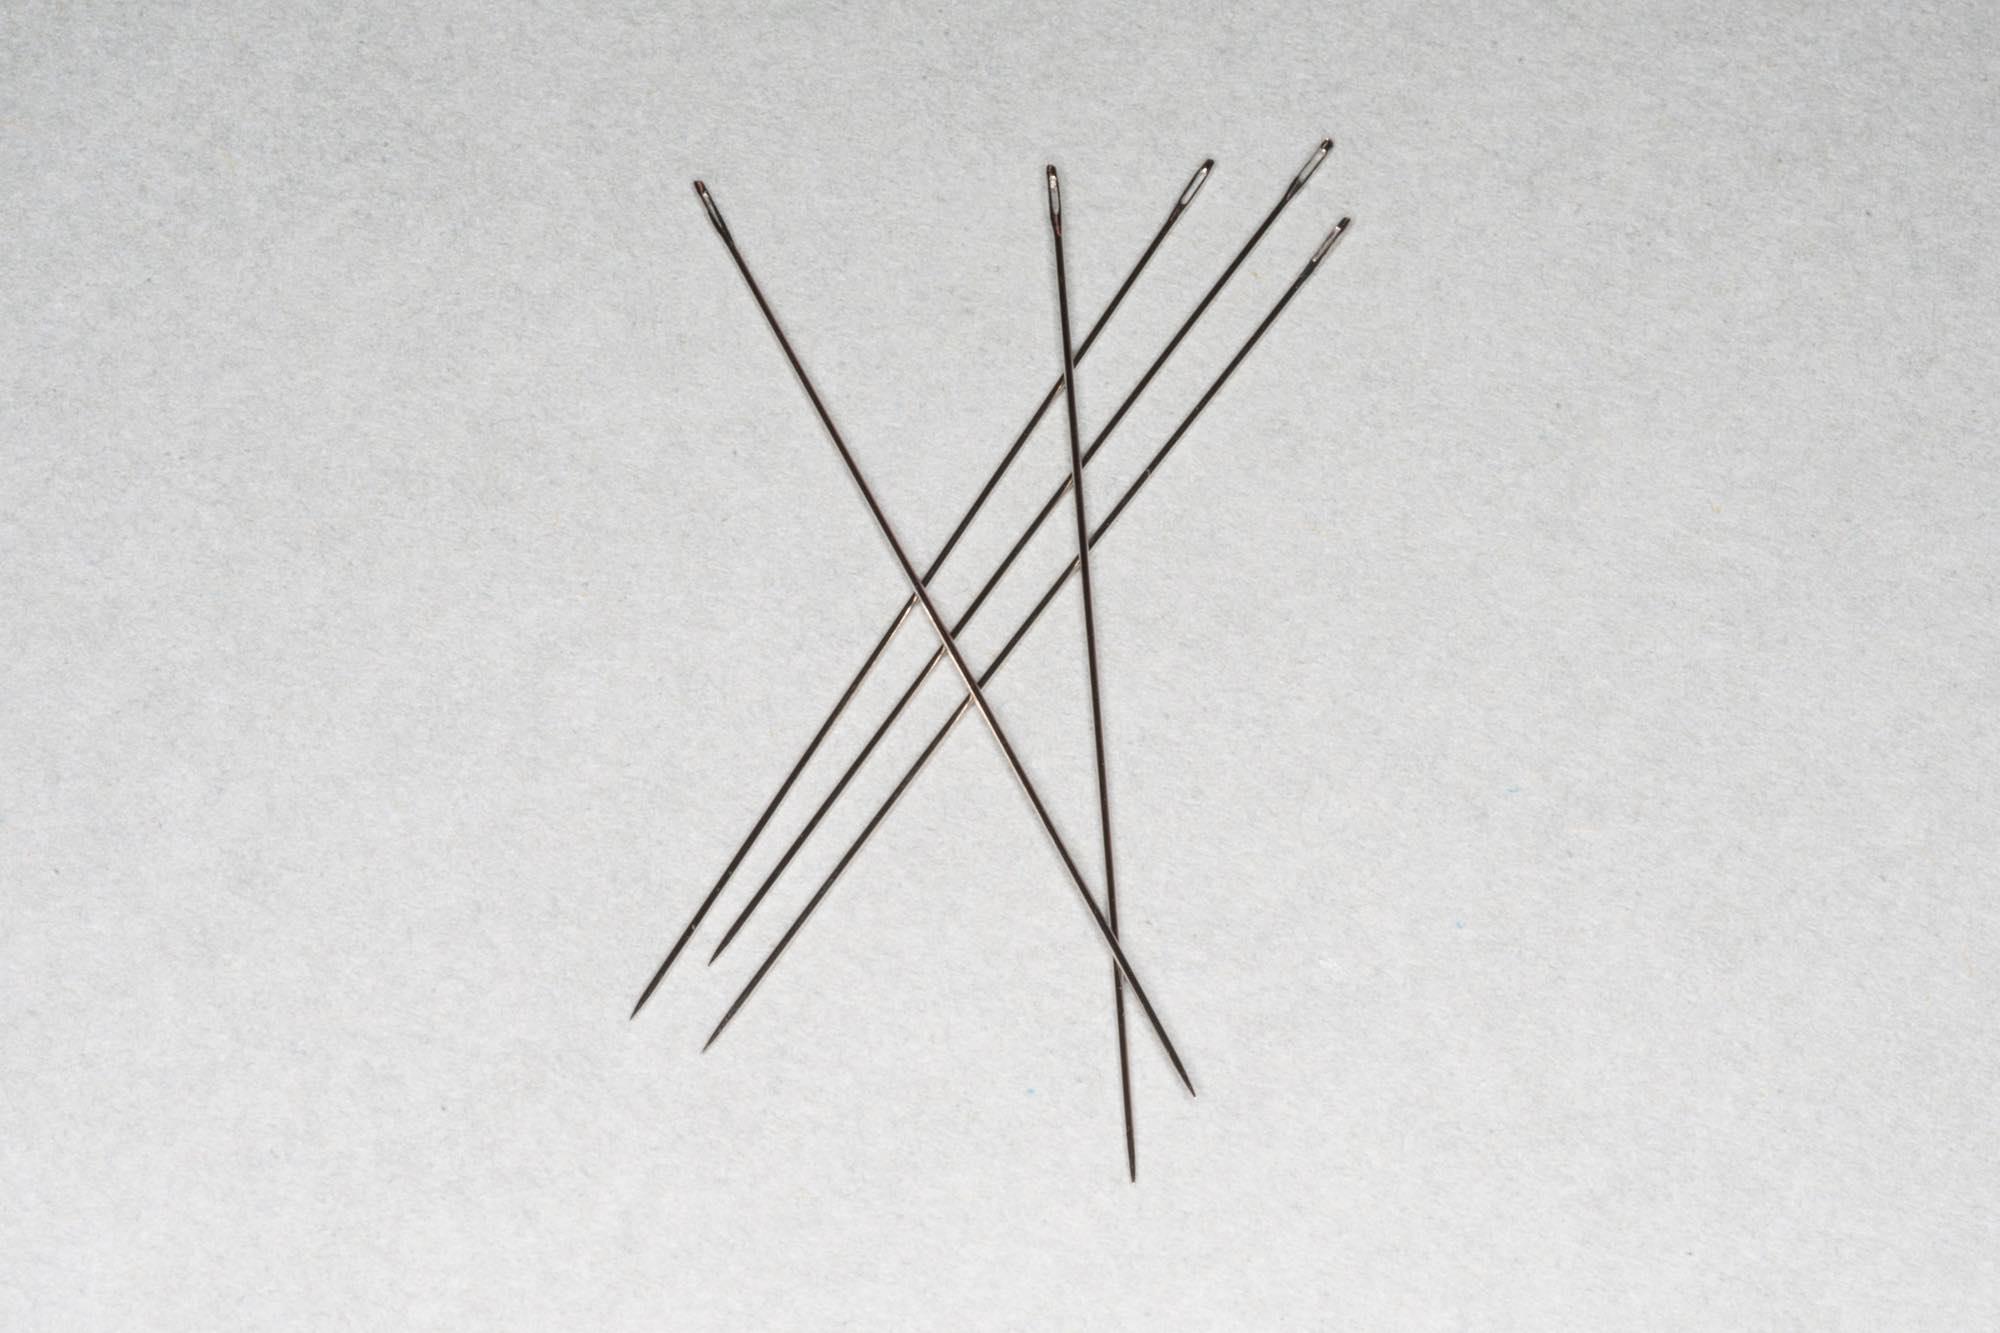 Fine Beading Needles / 5 Pack